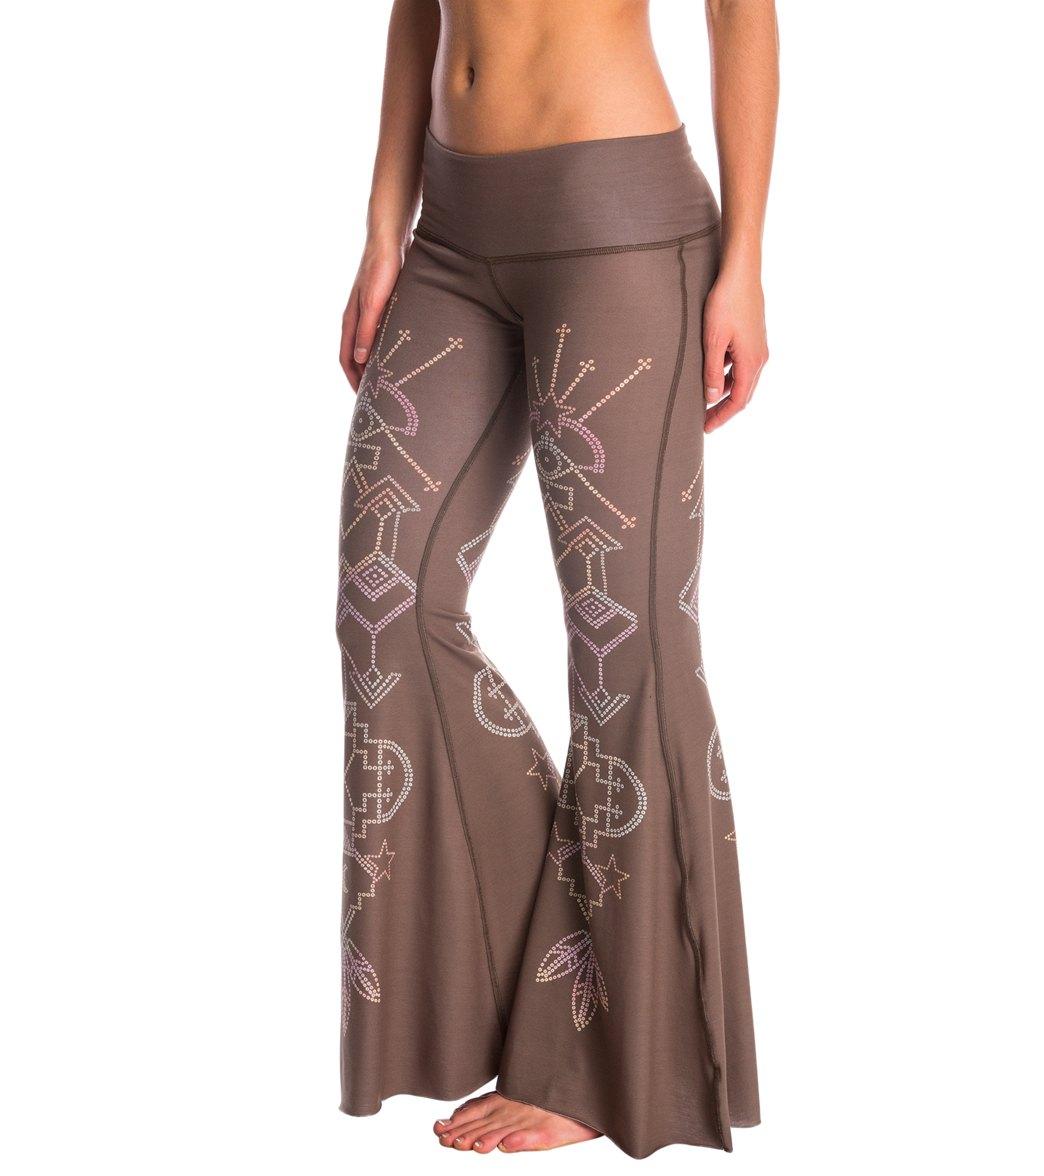 b634447399272d Teeki Seven Crowns Bell Bottom Yoga Pants at YogaOutlet.com - Free ...